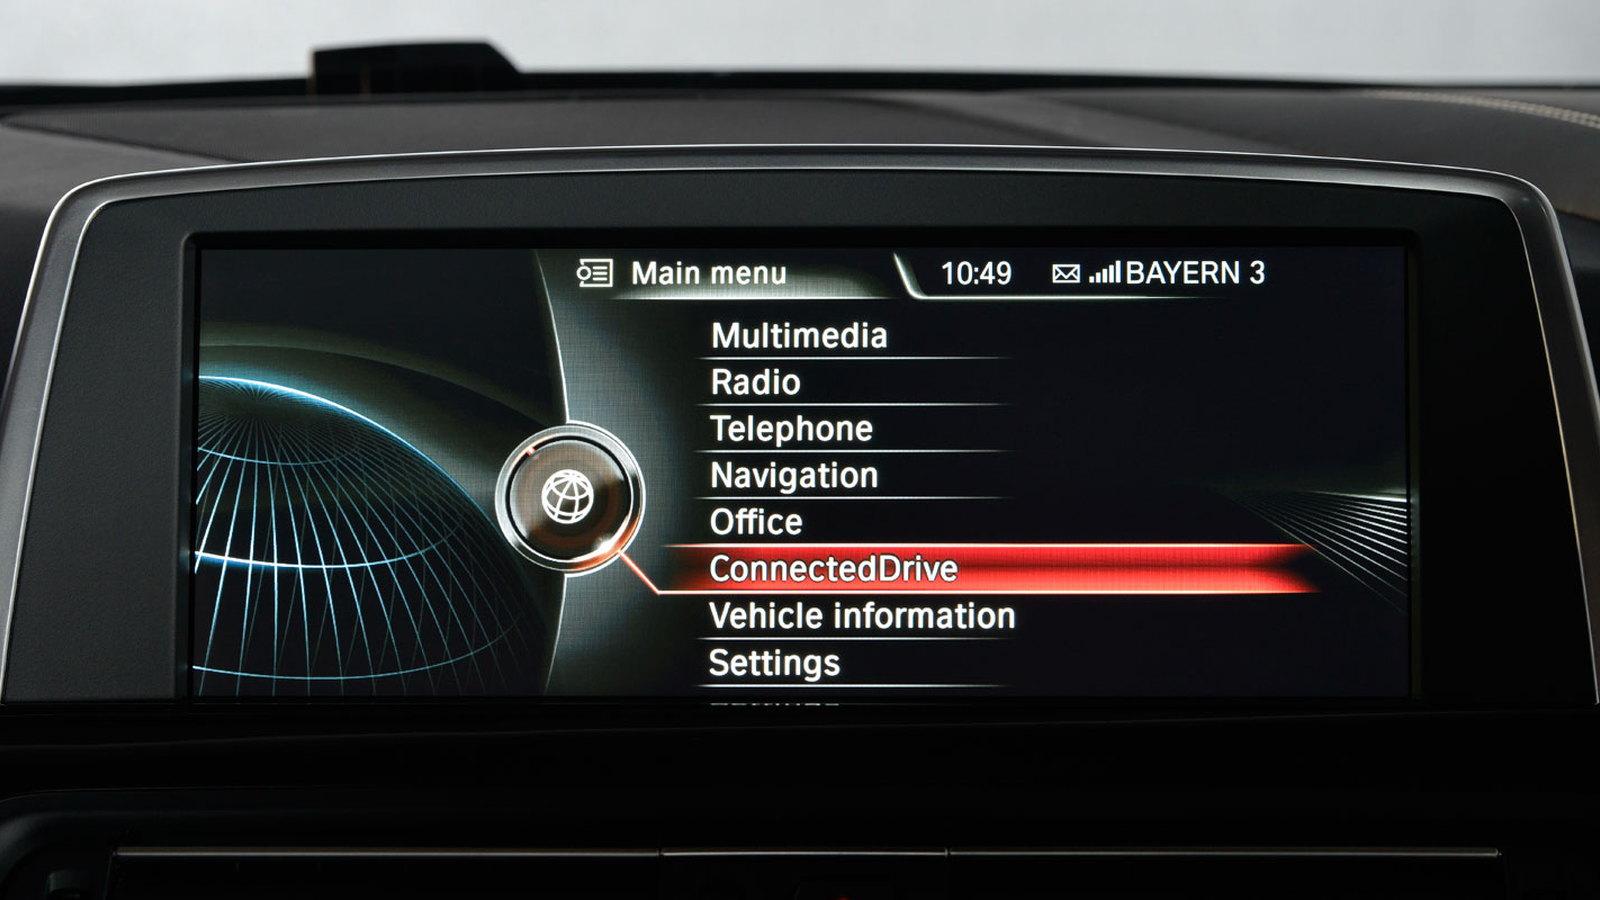 2013 BMW ConnectedDrive updates